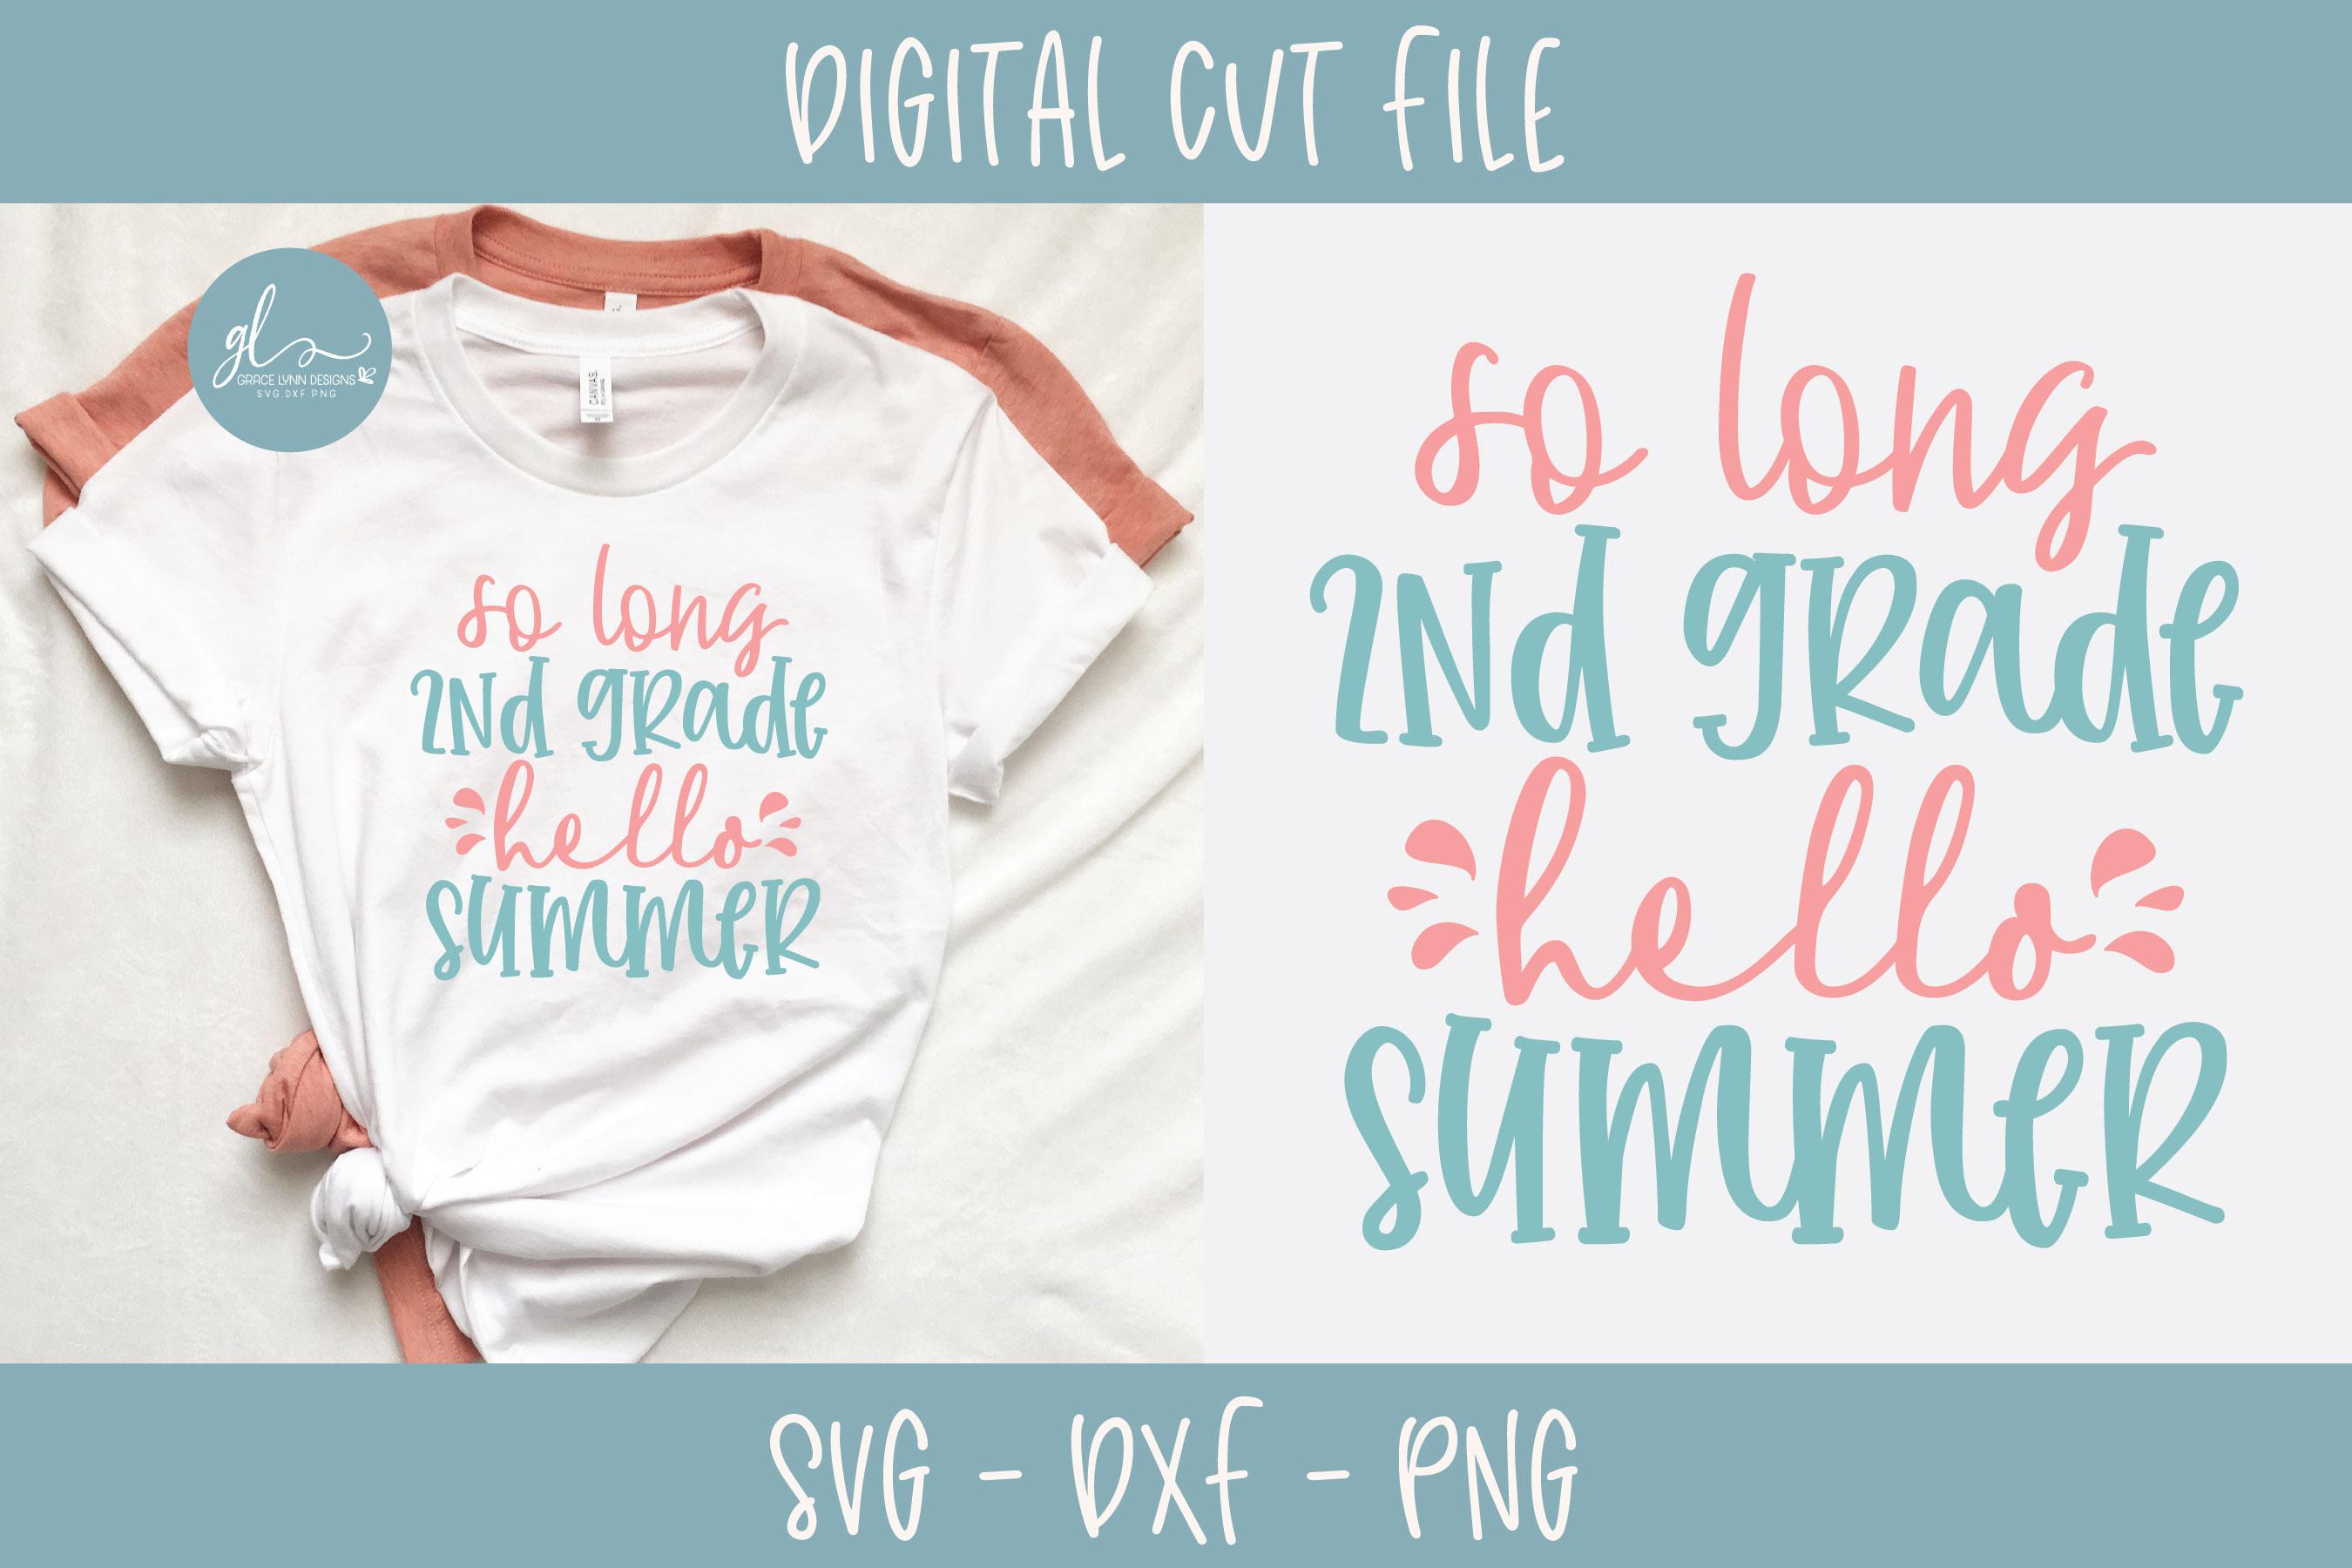 So Long 2nd Grade Hello Summer - SVG example image 1